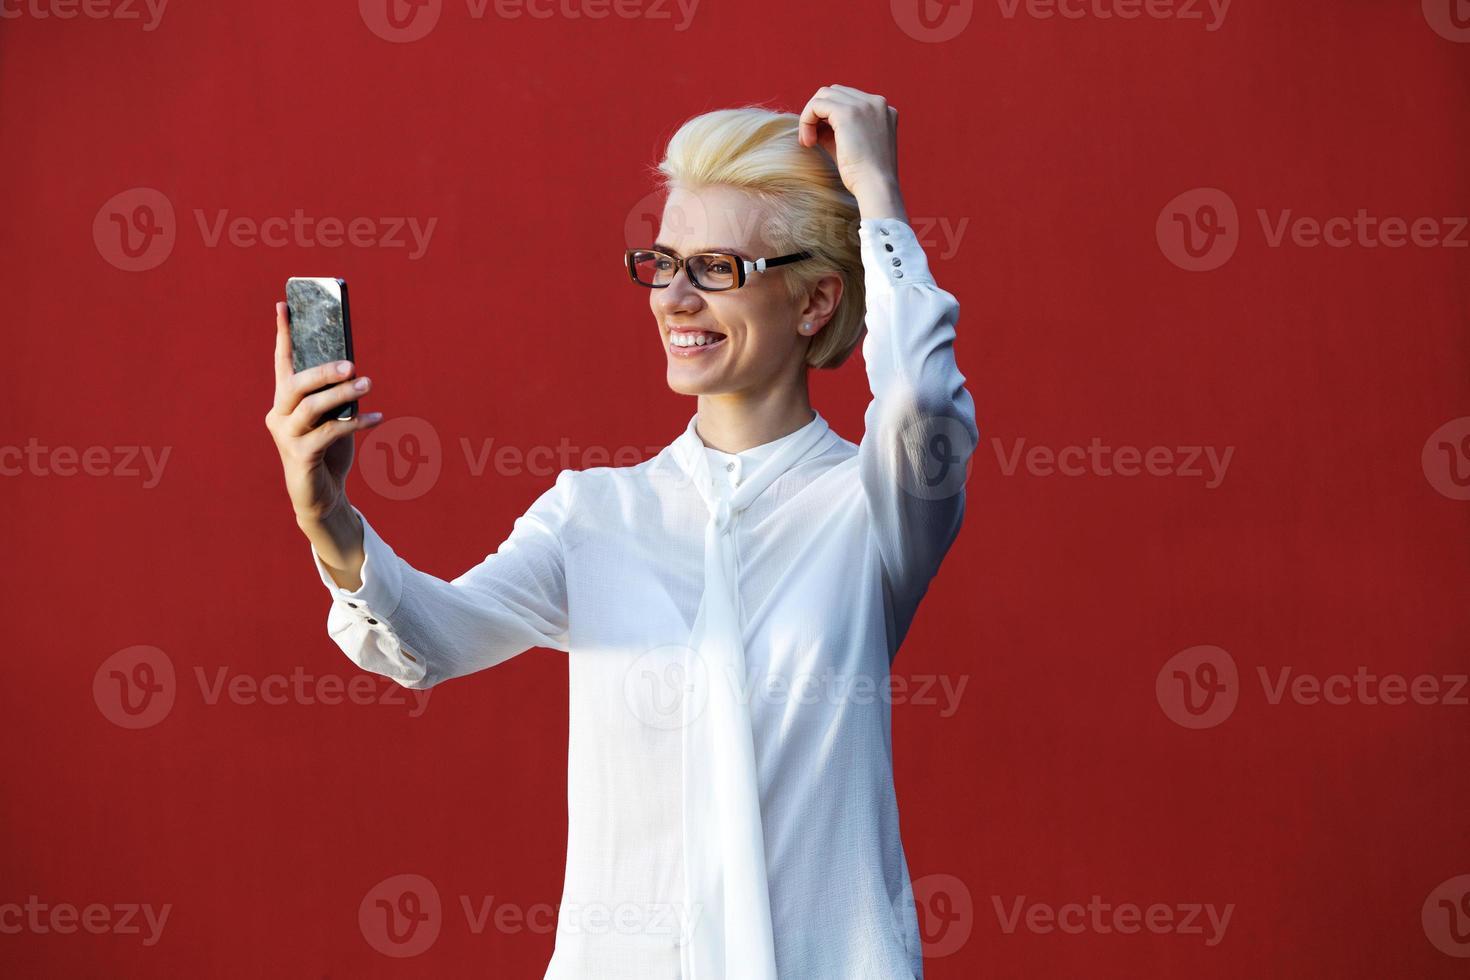 Souriante jeune femme blonde prenant selfie photo